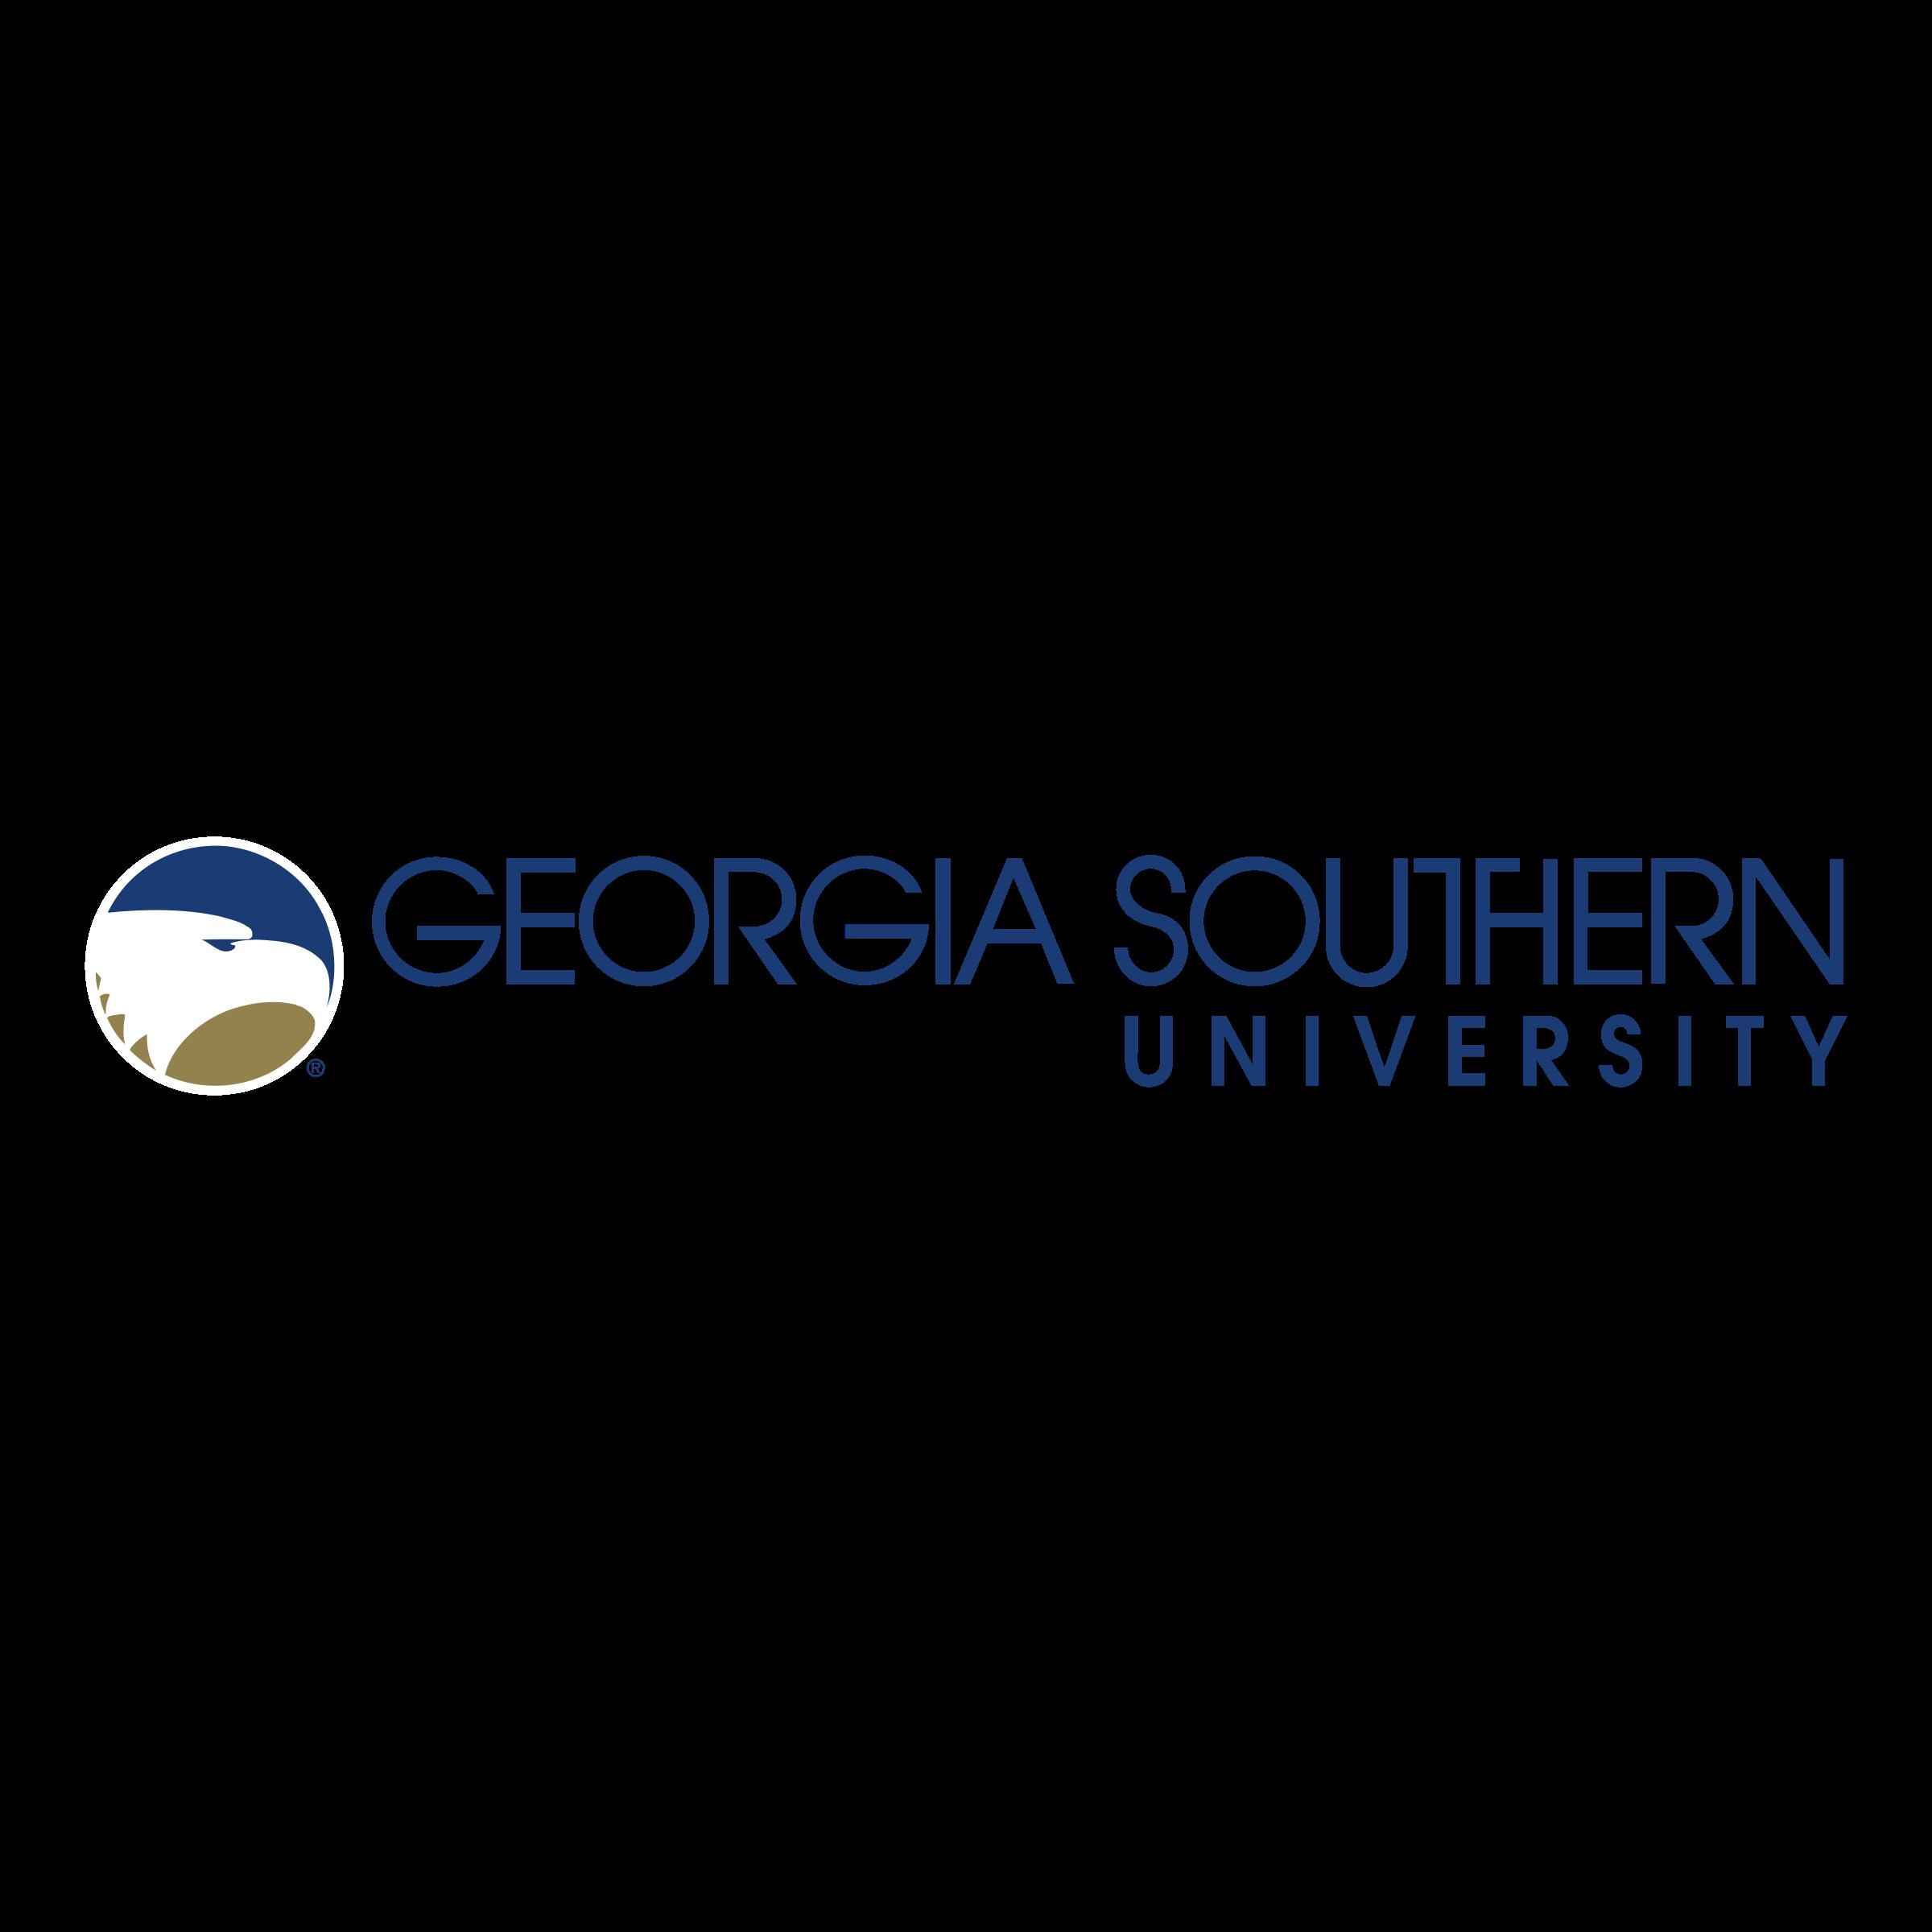 8477b305980 Georgia Southern University Logo PNG Transparent   SVG Vector ...